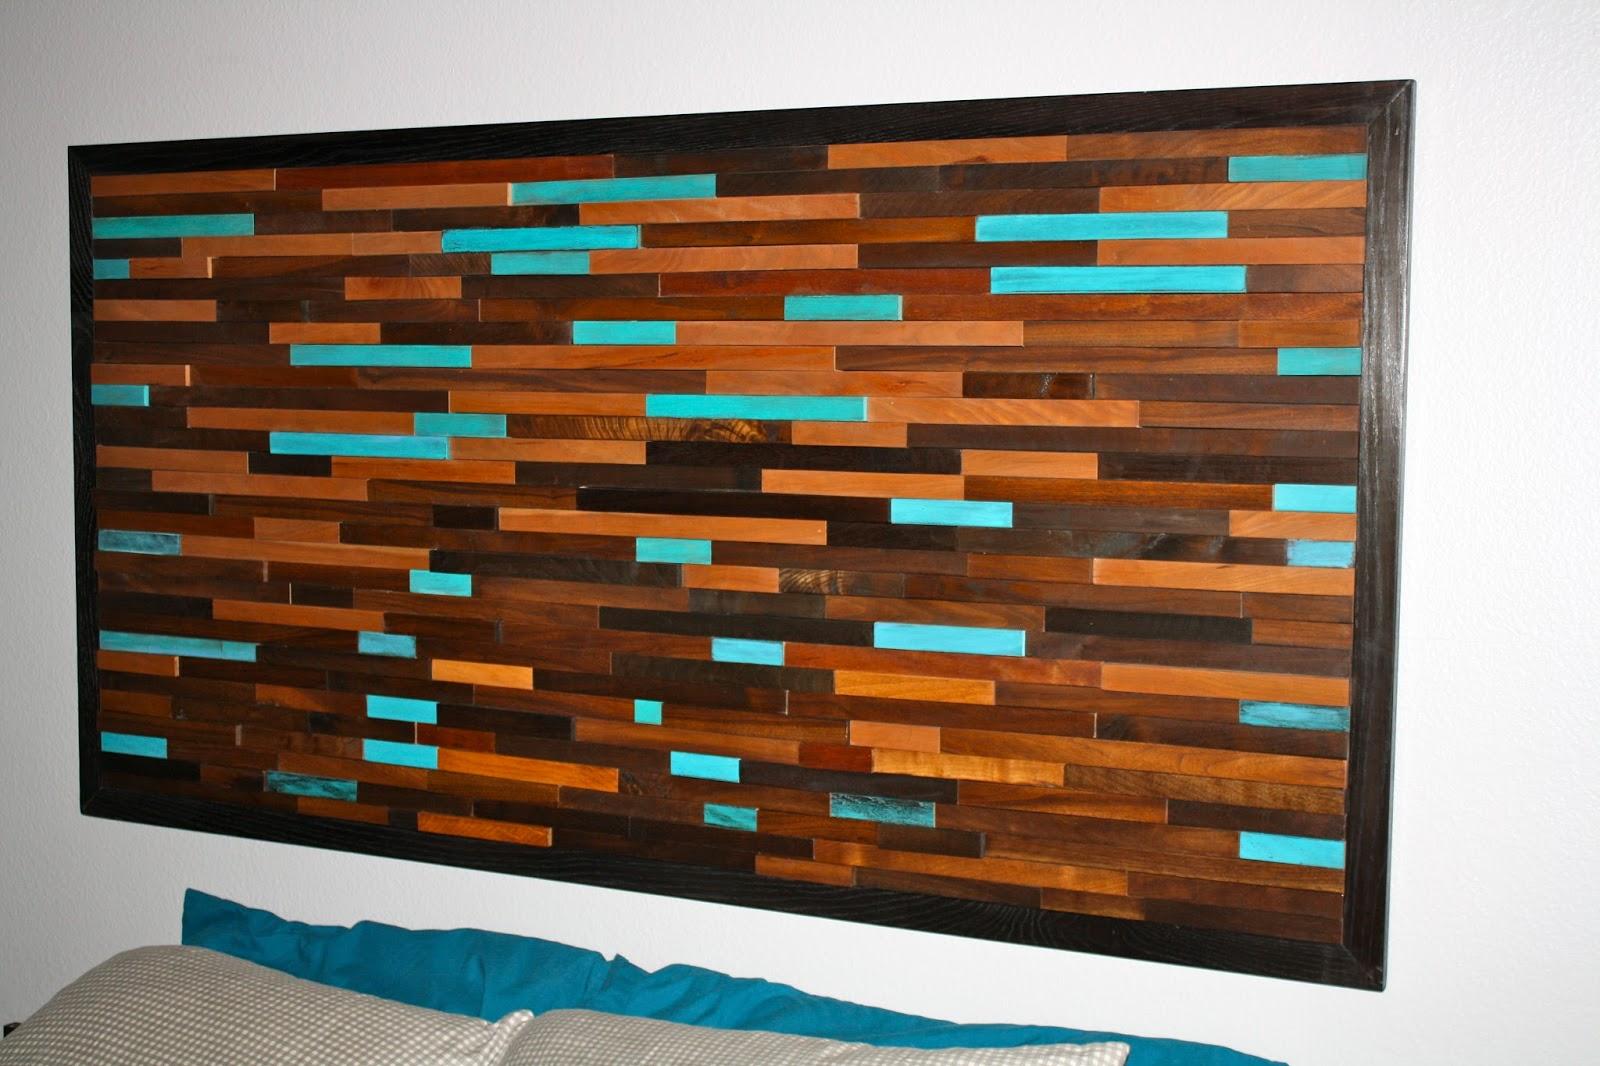 MakeMePrettyAgain: Wood wall art/headboard